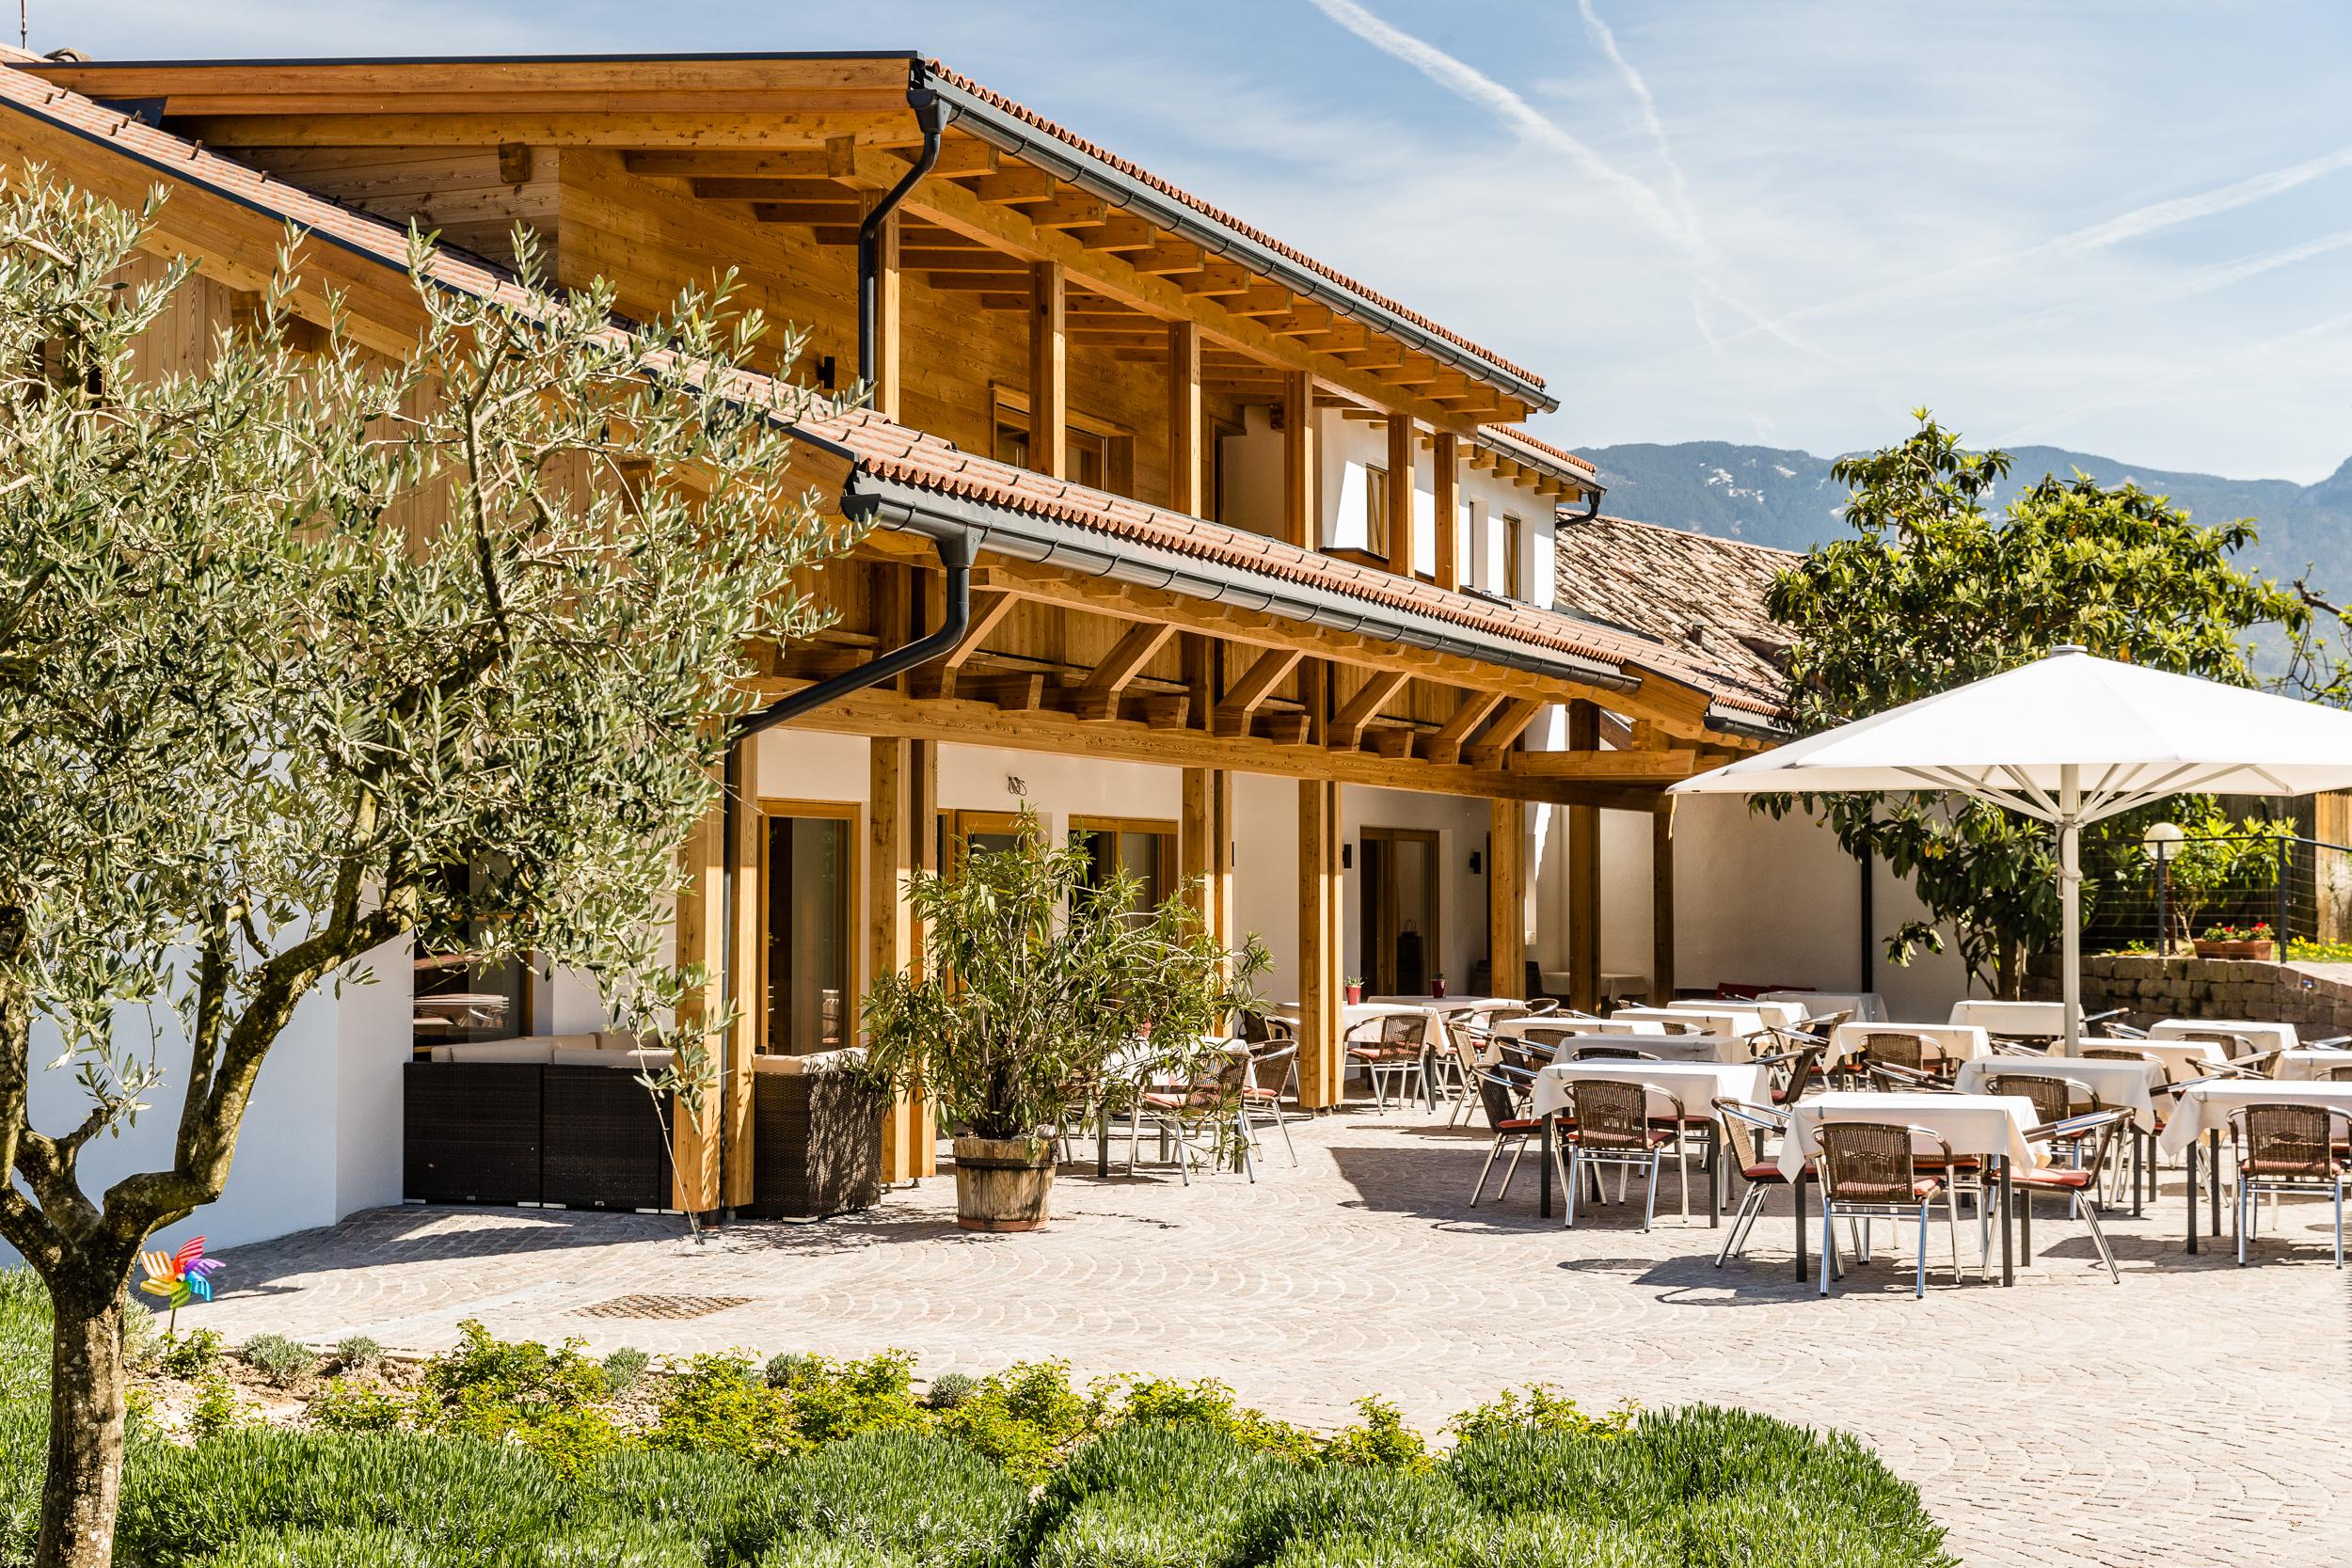 Pension am kalterer see hotel hasslhof weinhotel am for Boutique hotel kaltern